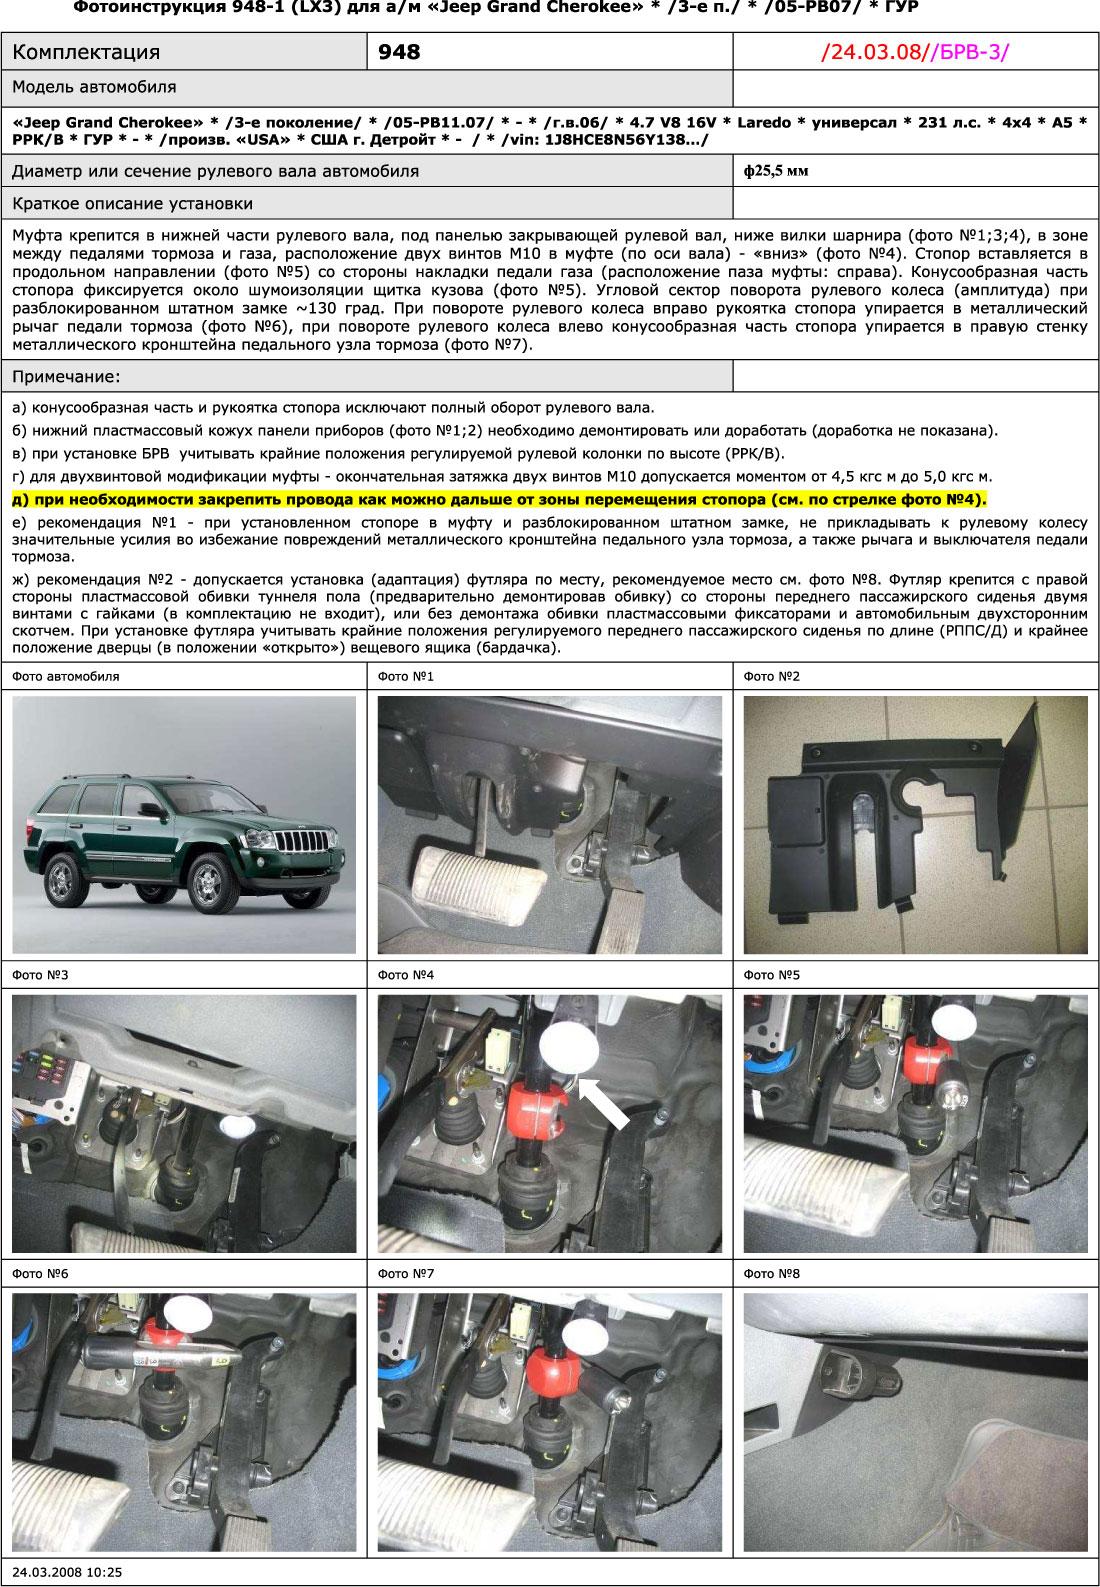 Блокиратор рулевого вала для JEEP GRAND CHEROKEE LIMITED 3-е пок. /2005-2007/ ГУР - Гарант Блок Люкс 948.E